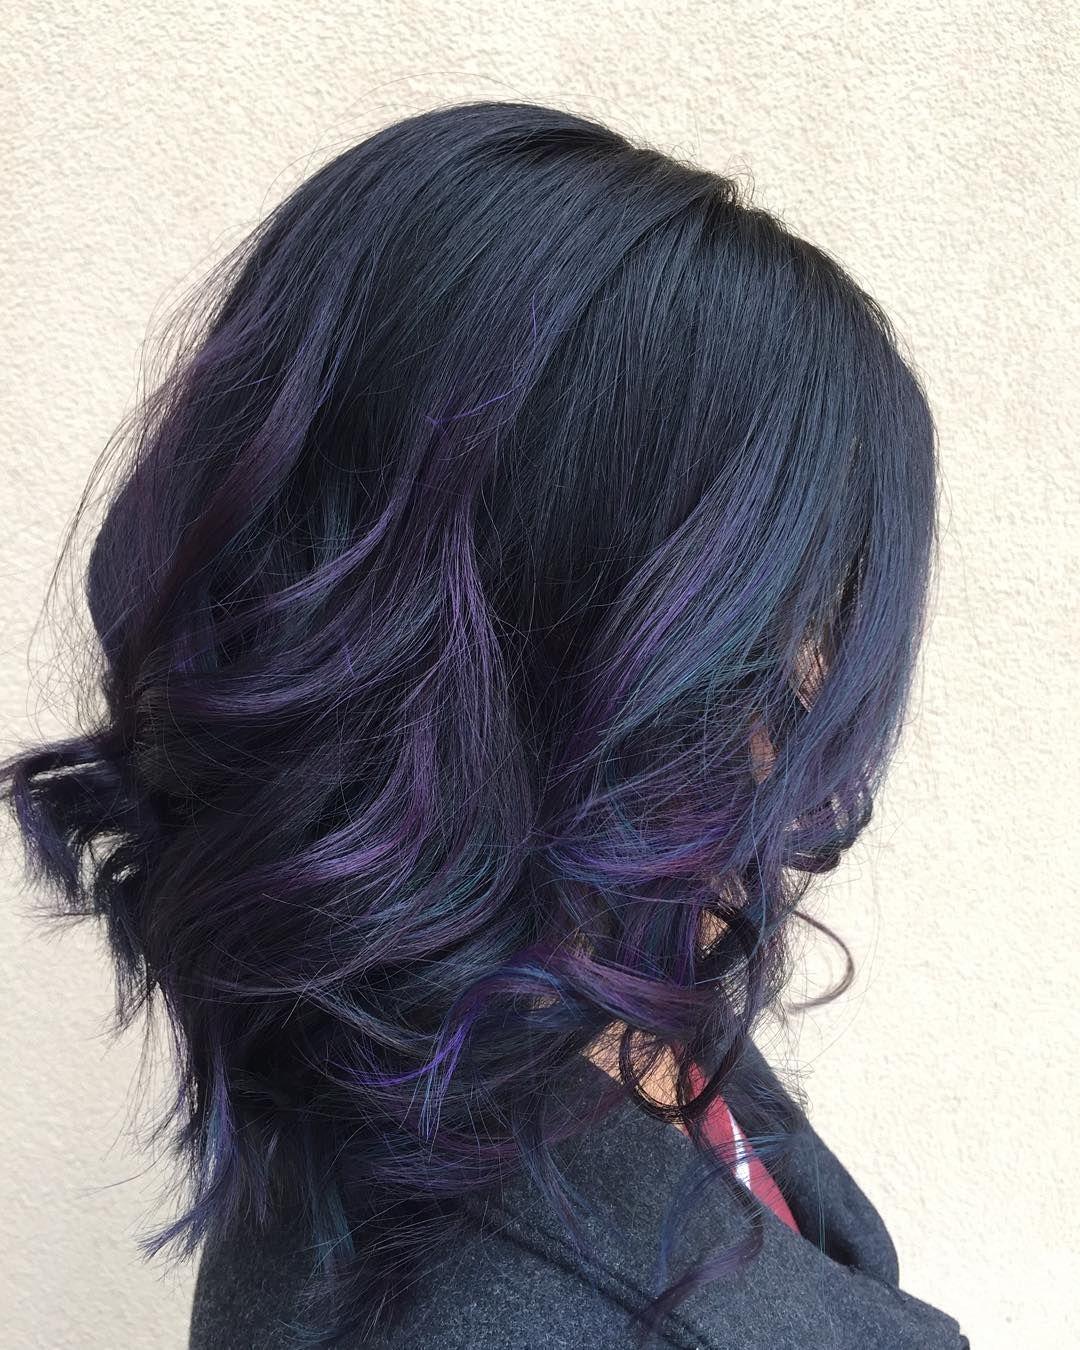 Nadine Eberts On Instagram Another Oil Slick Thanks For Letting Me Play Theresita Pravana Oilslick Oil Slick Hair Gorgeous Hair Color Thick Hair Styles